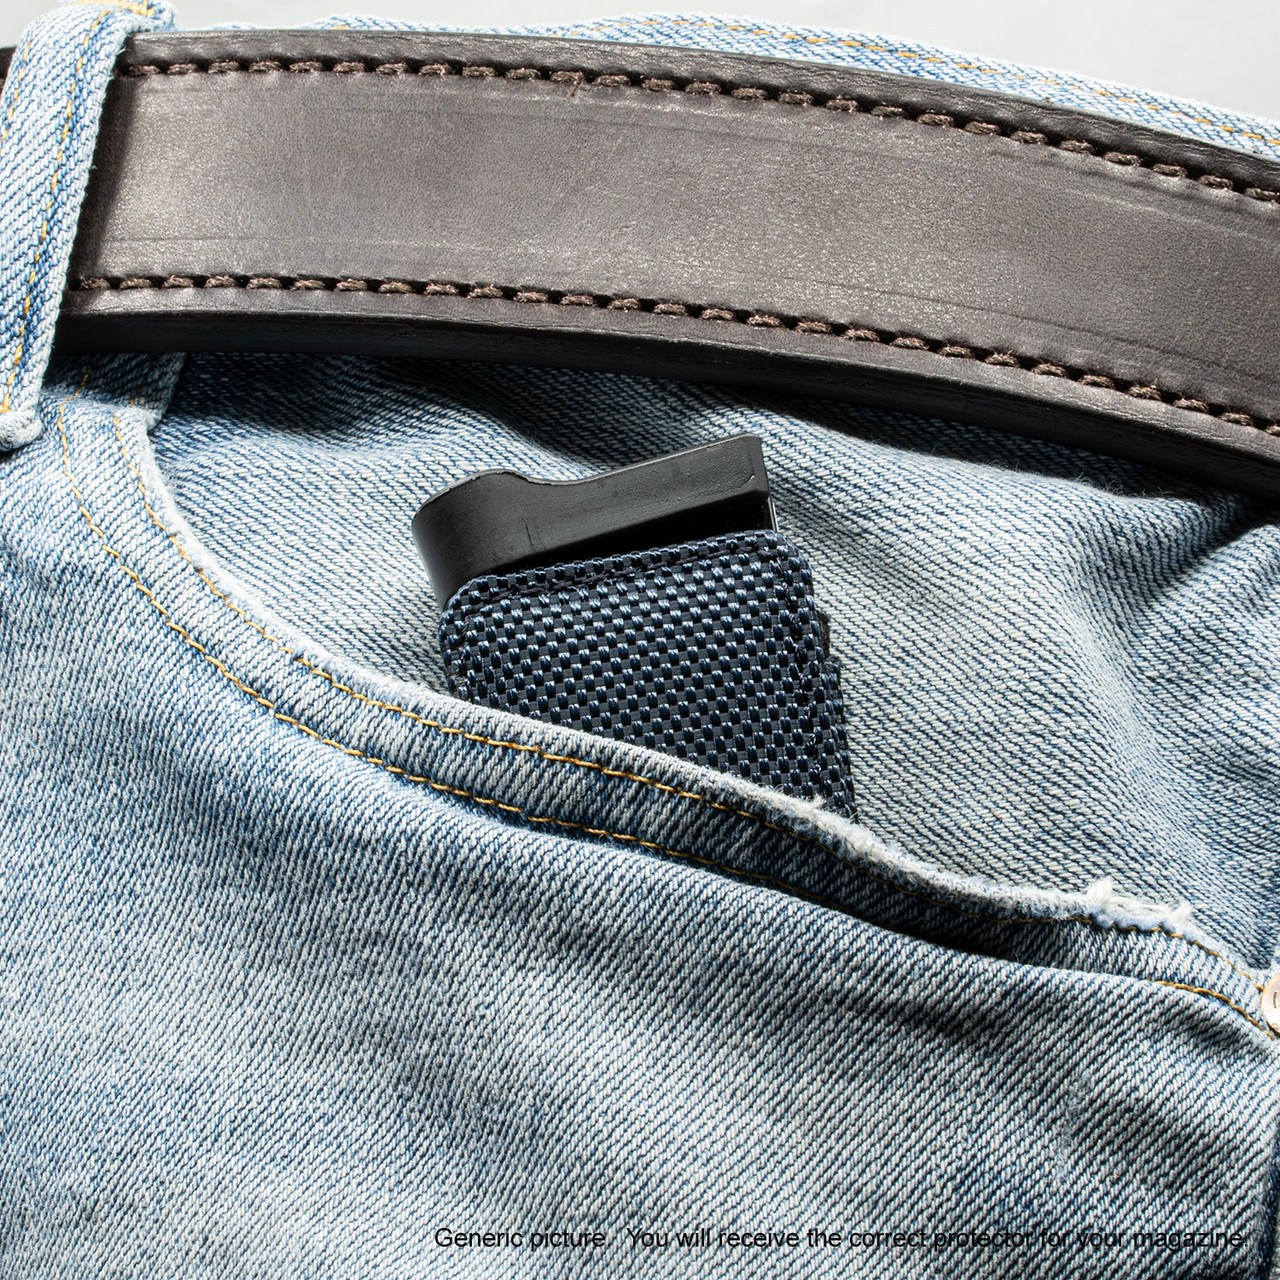 Beretta 84fs Cheetah Blue Covert Magazine Pocket Protector